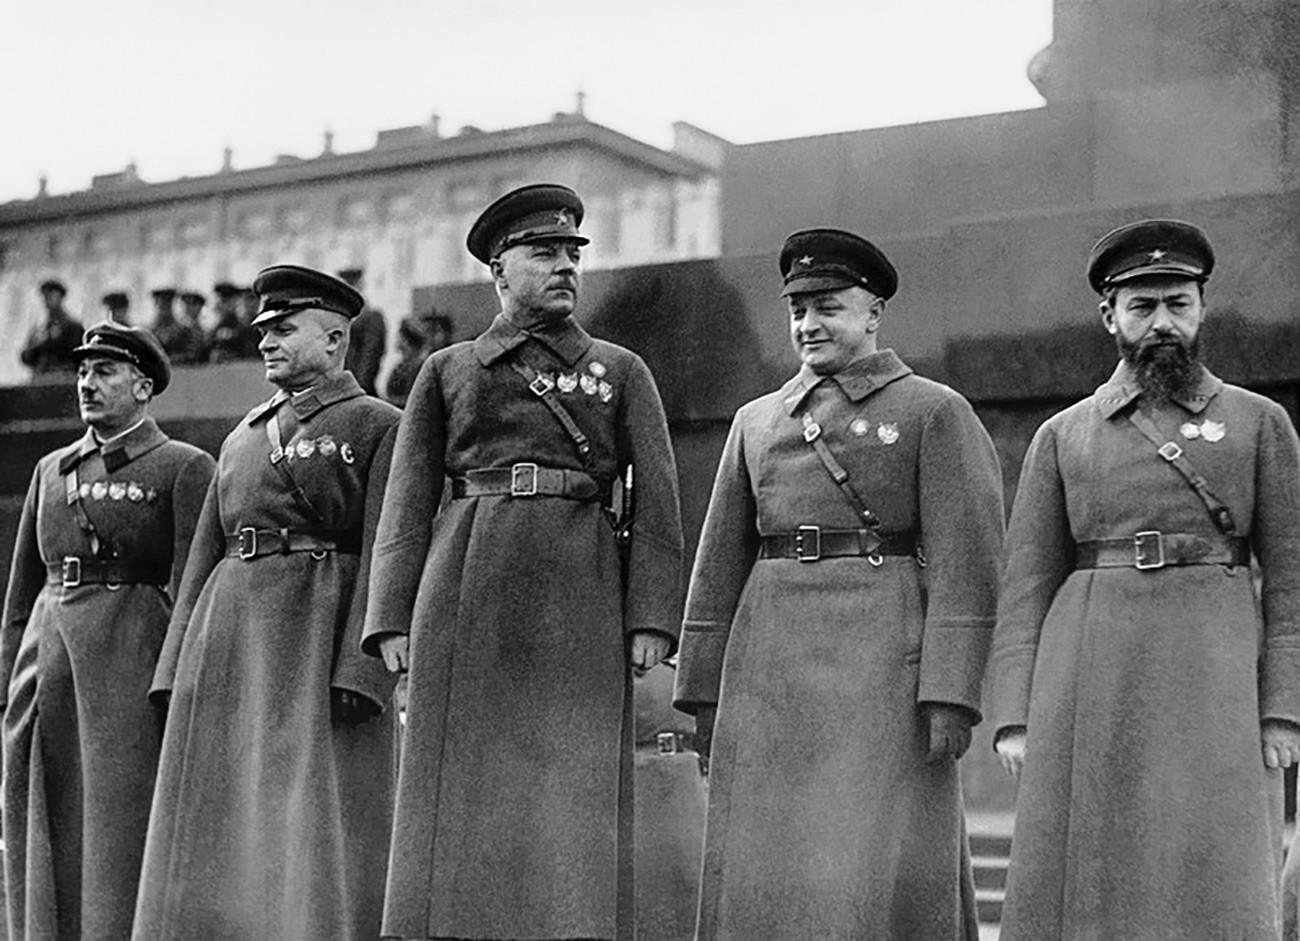 Guenrij Yágoda, Alexánder Yegórov, Kliment Voroshílov, Mijaíl Tujachevski, Yan Gamarnik.